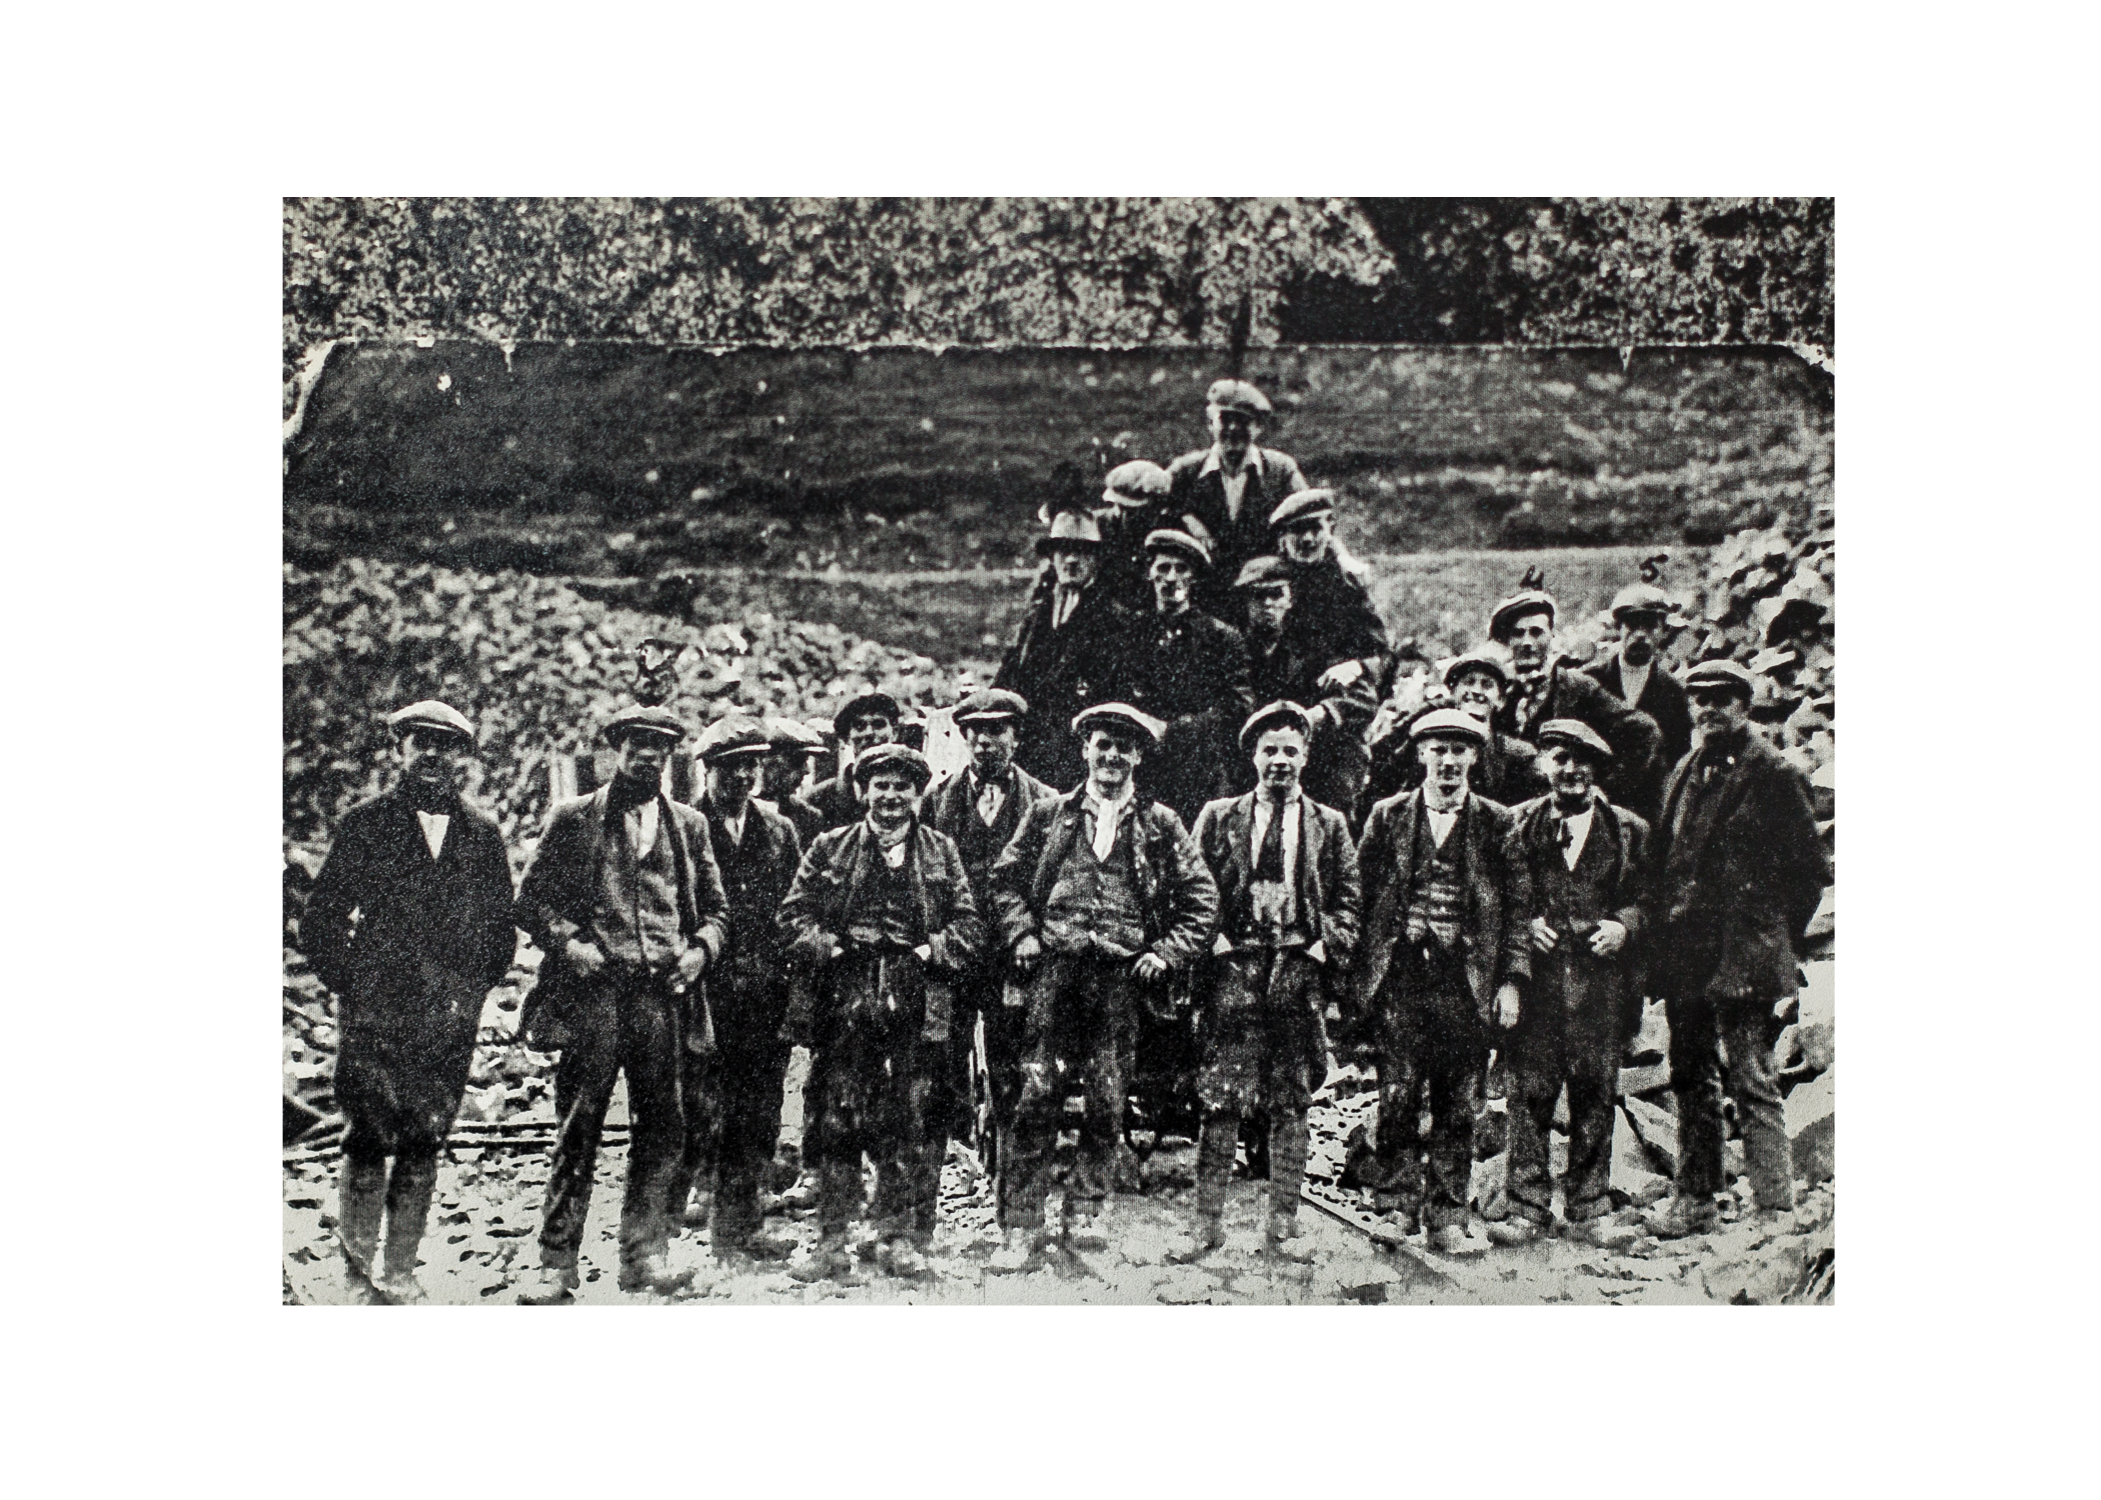 Talgarh Project - Archival image workers